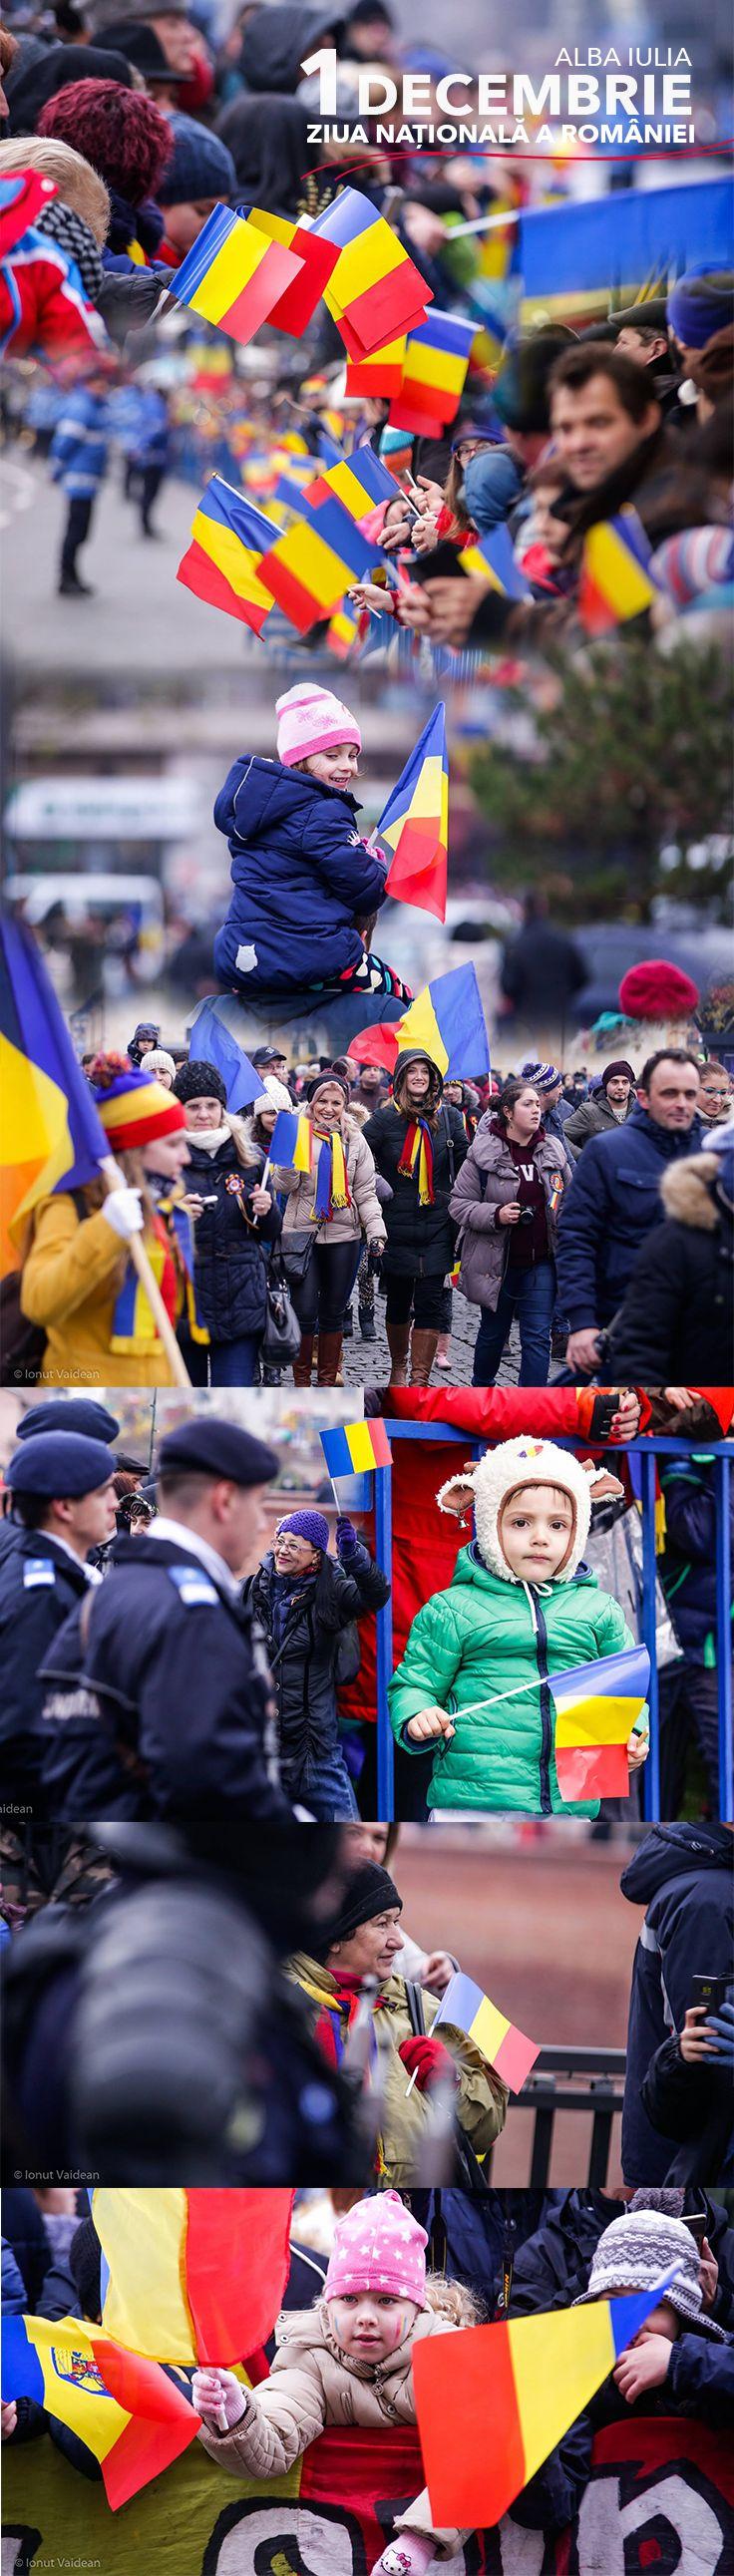 Ziua Nationala a Romaniei, Alba Iulia